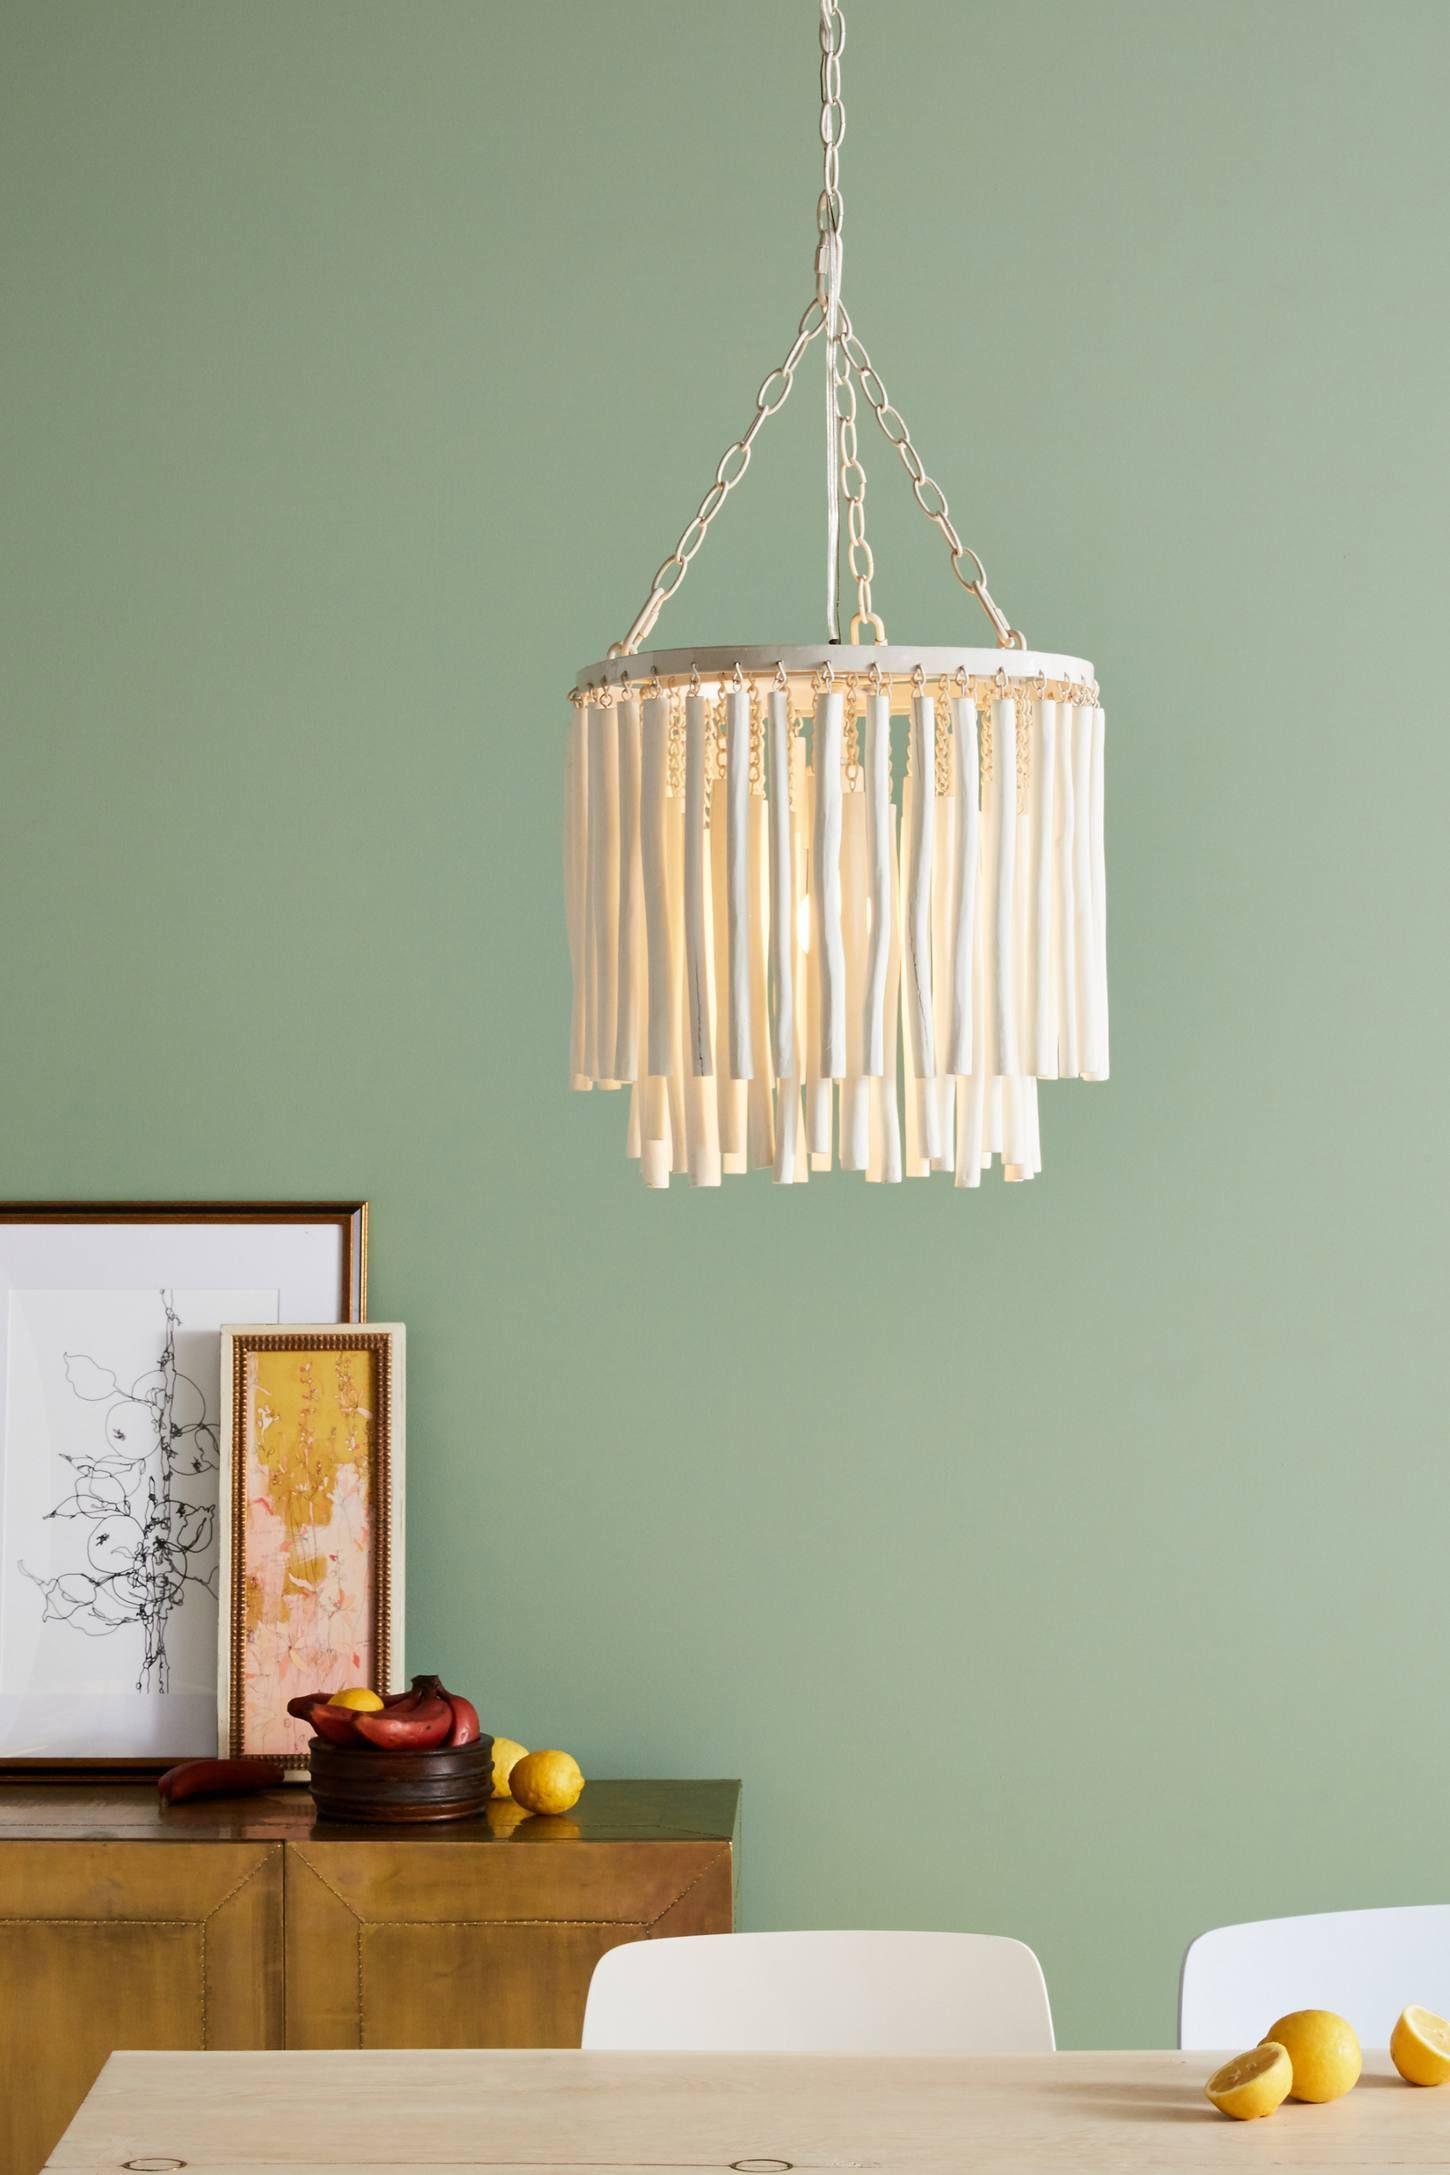 Tilda Pendant | Pendants, Lights and Living room lighting